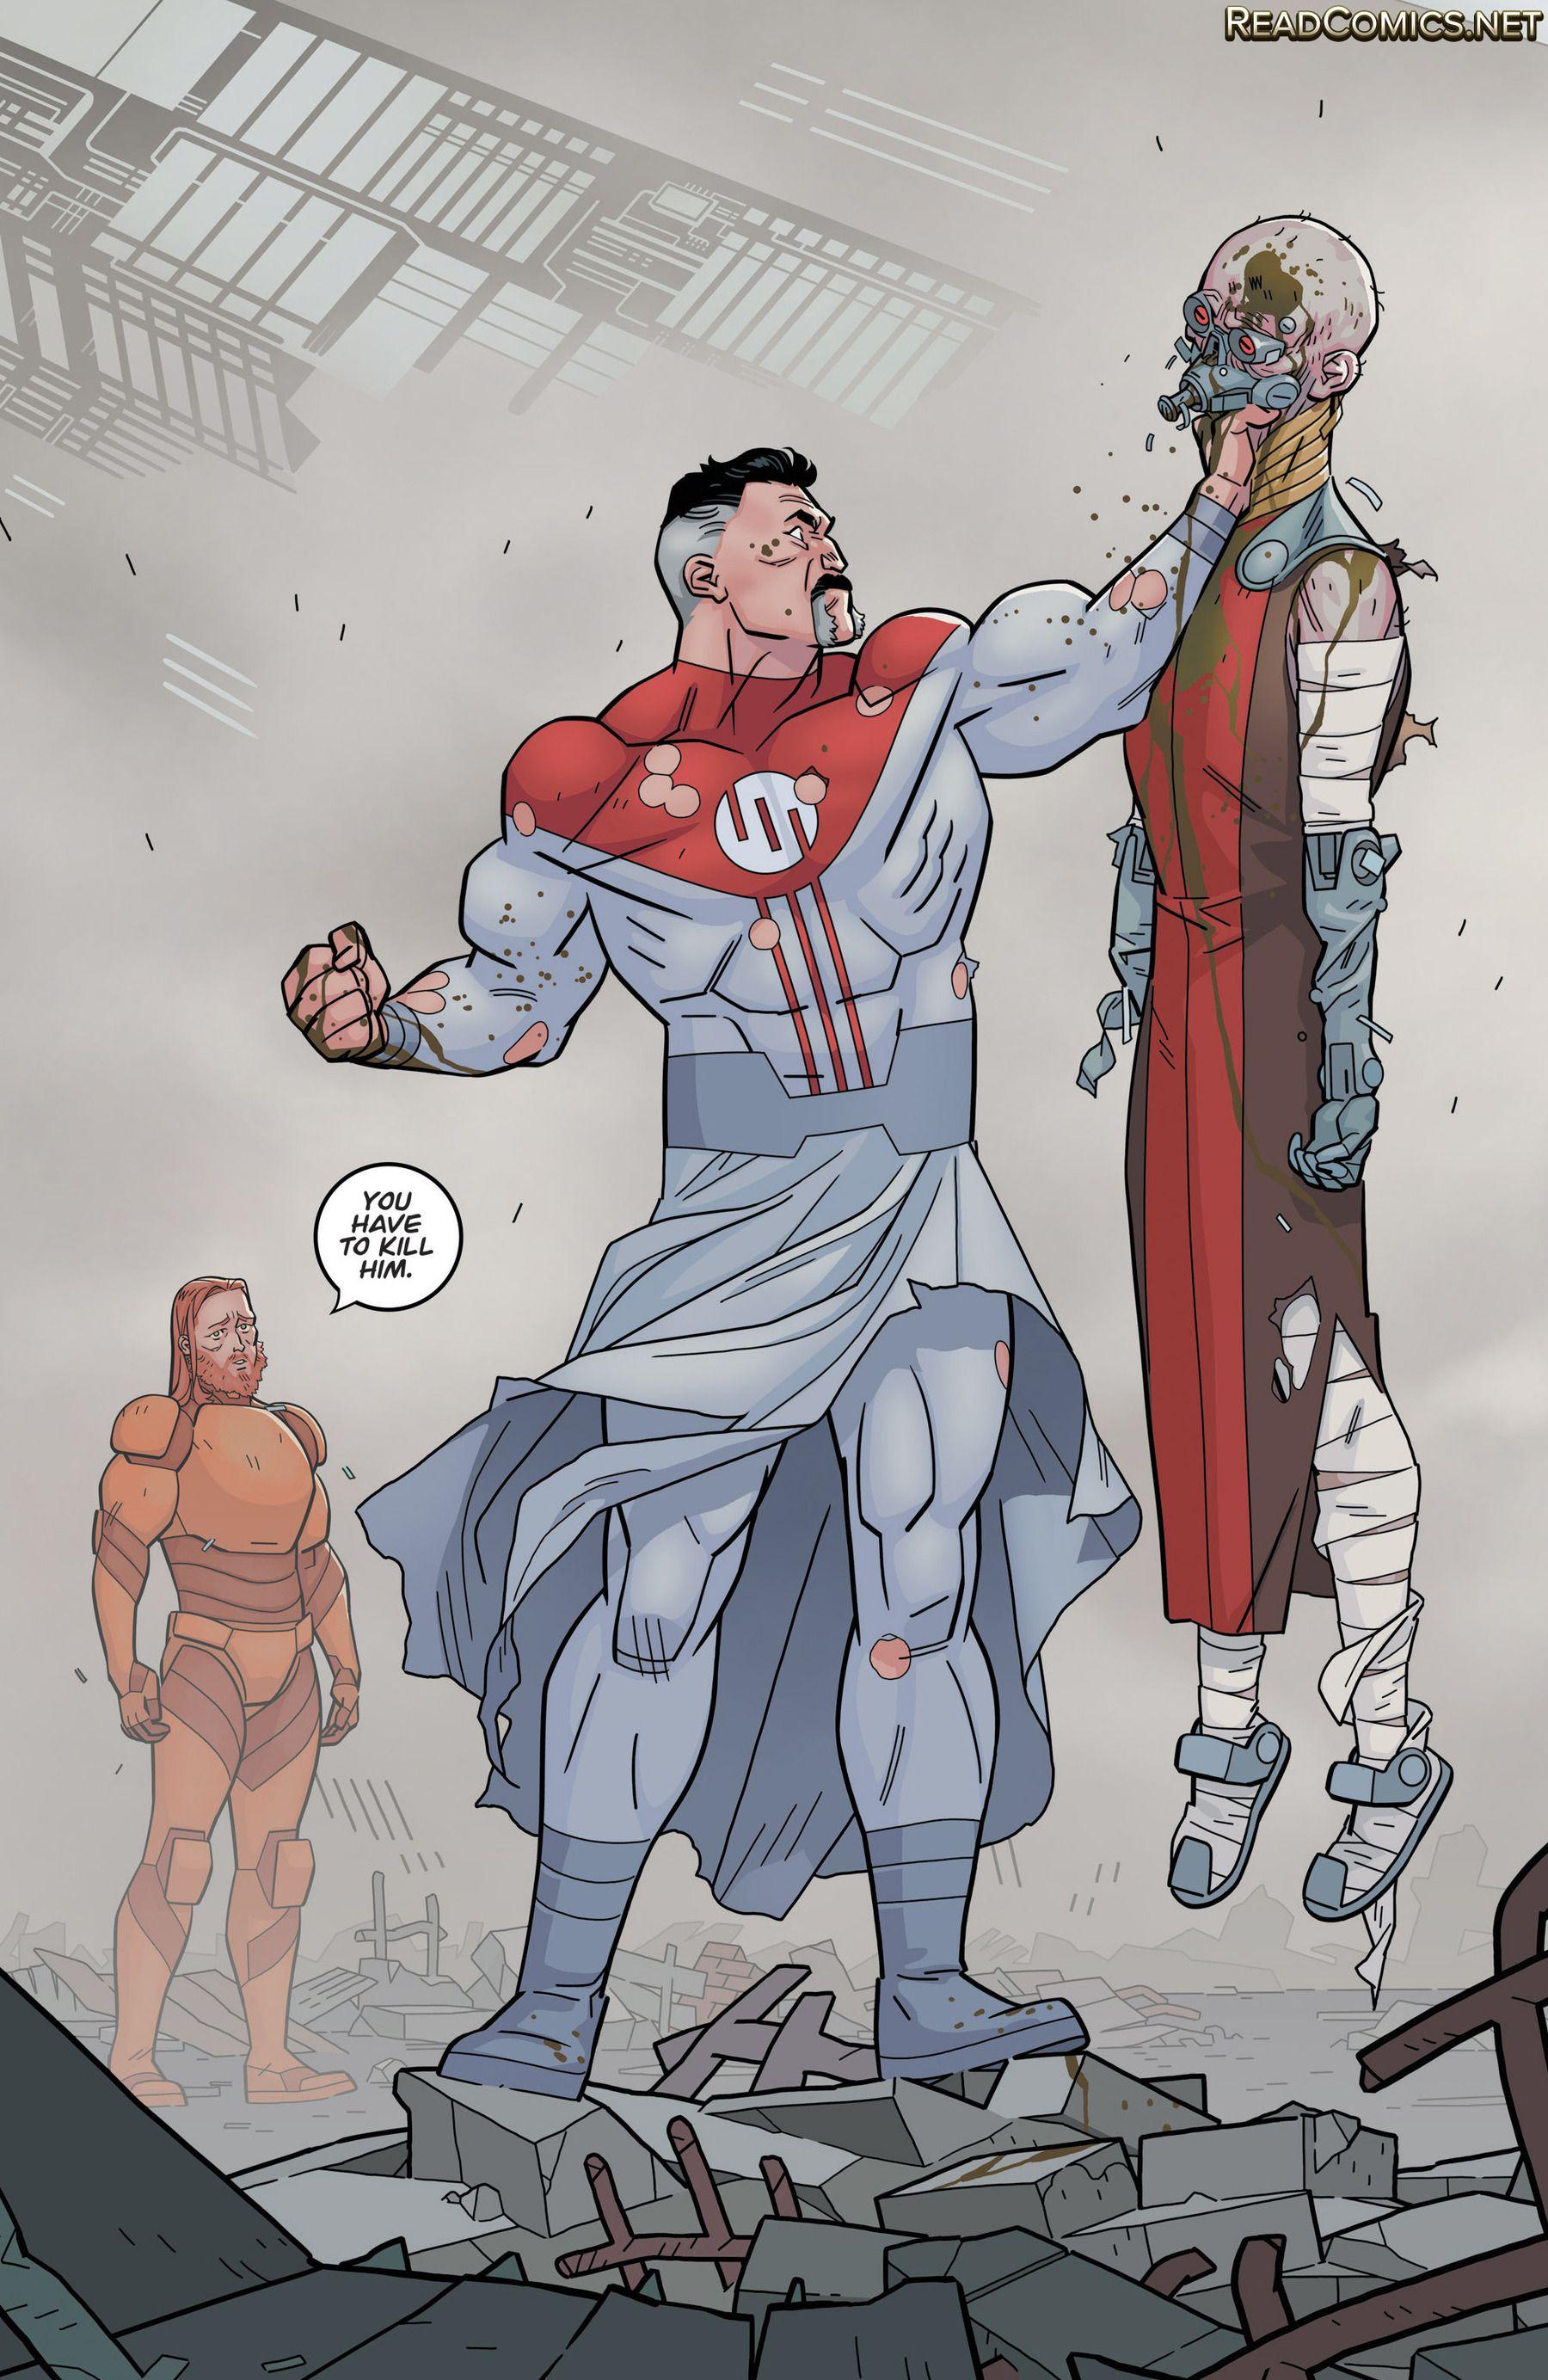 Robot and Omni-Man from Invincible | Marvel comics vintage, Invincible comic, Superhero art